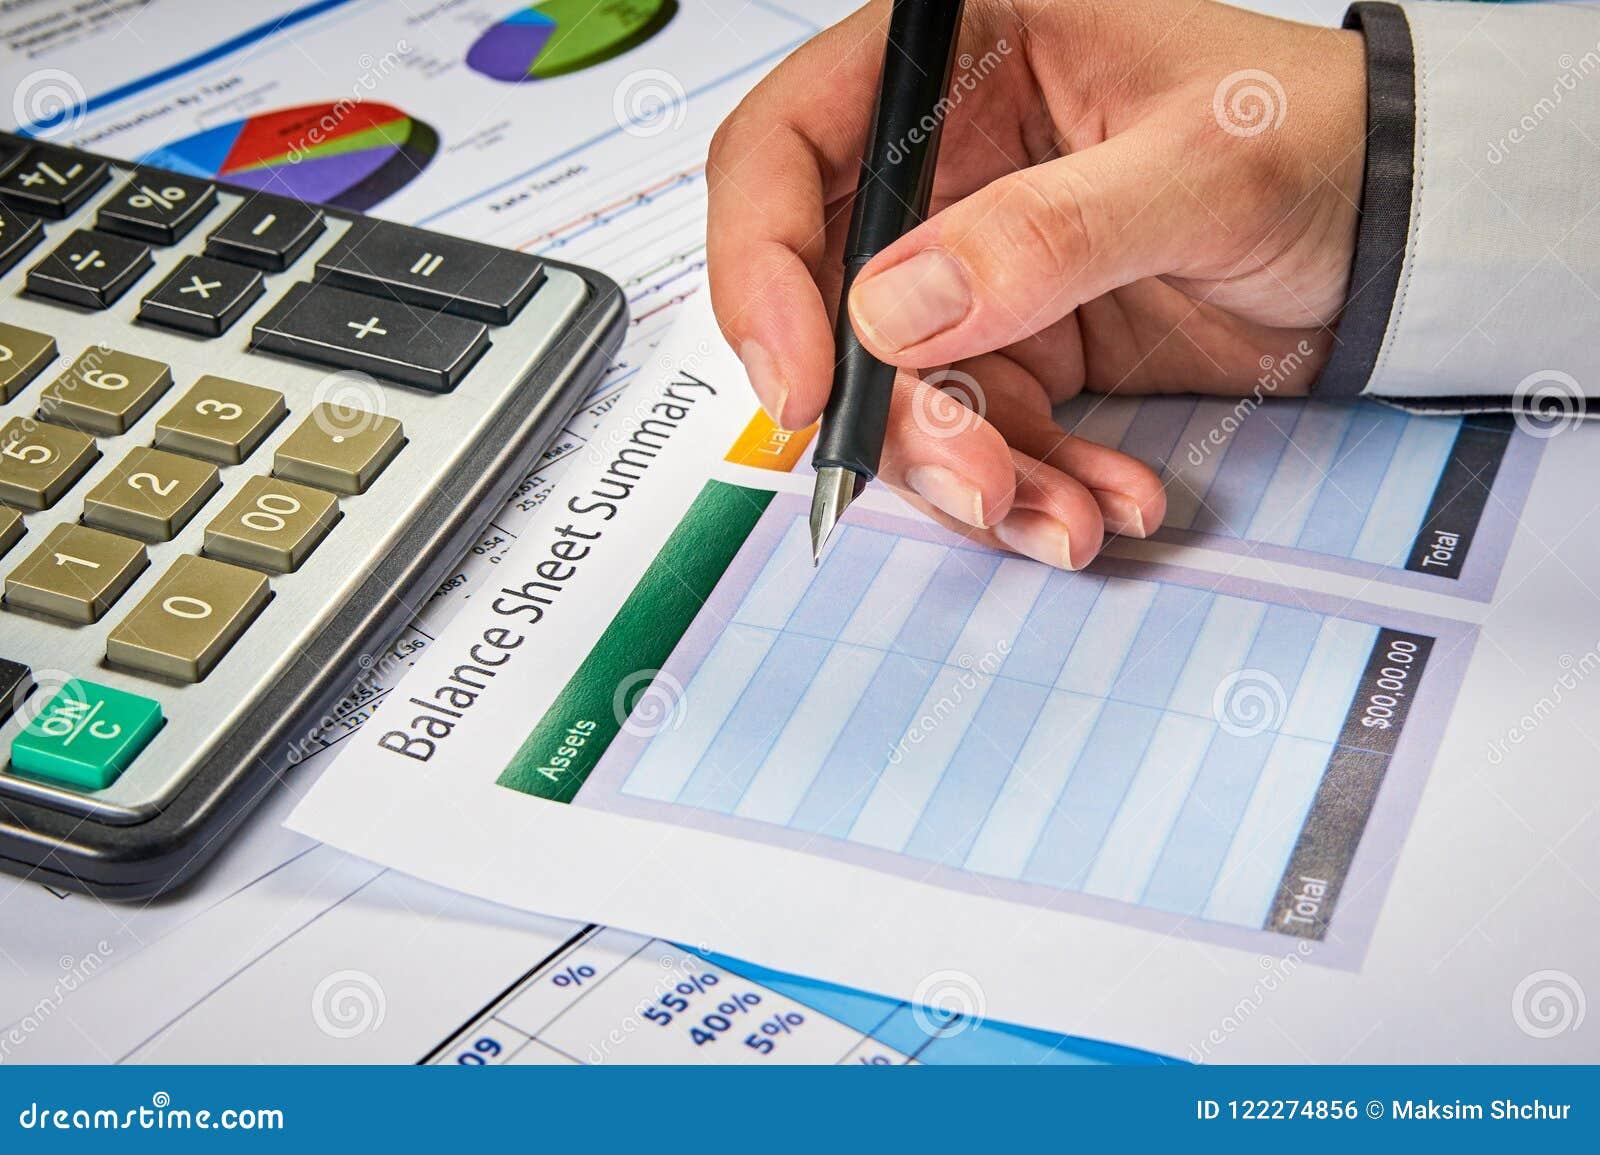 write in balance sheet summary stock photo image of hand